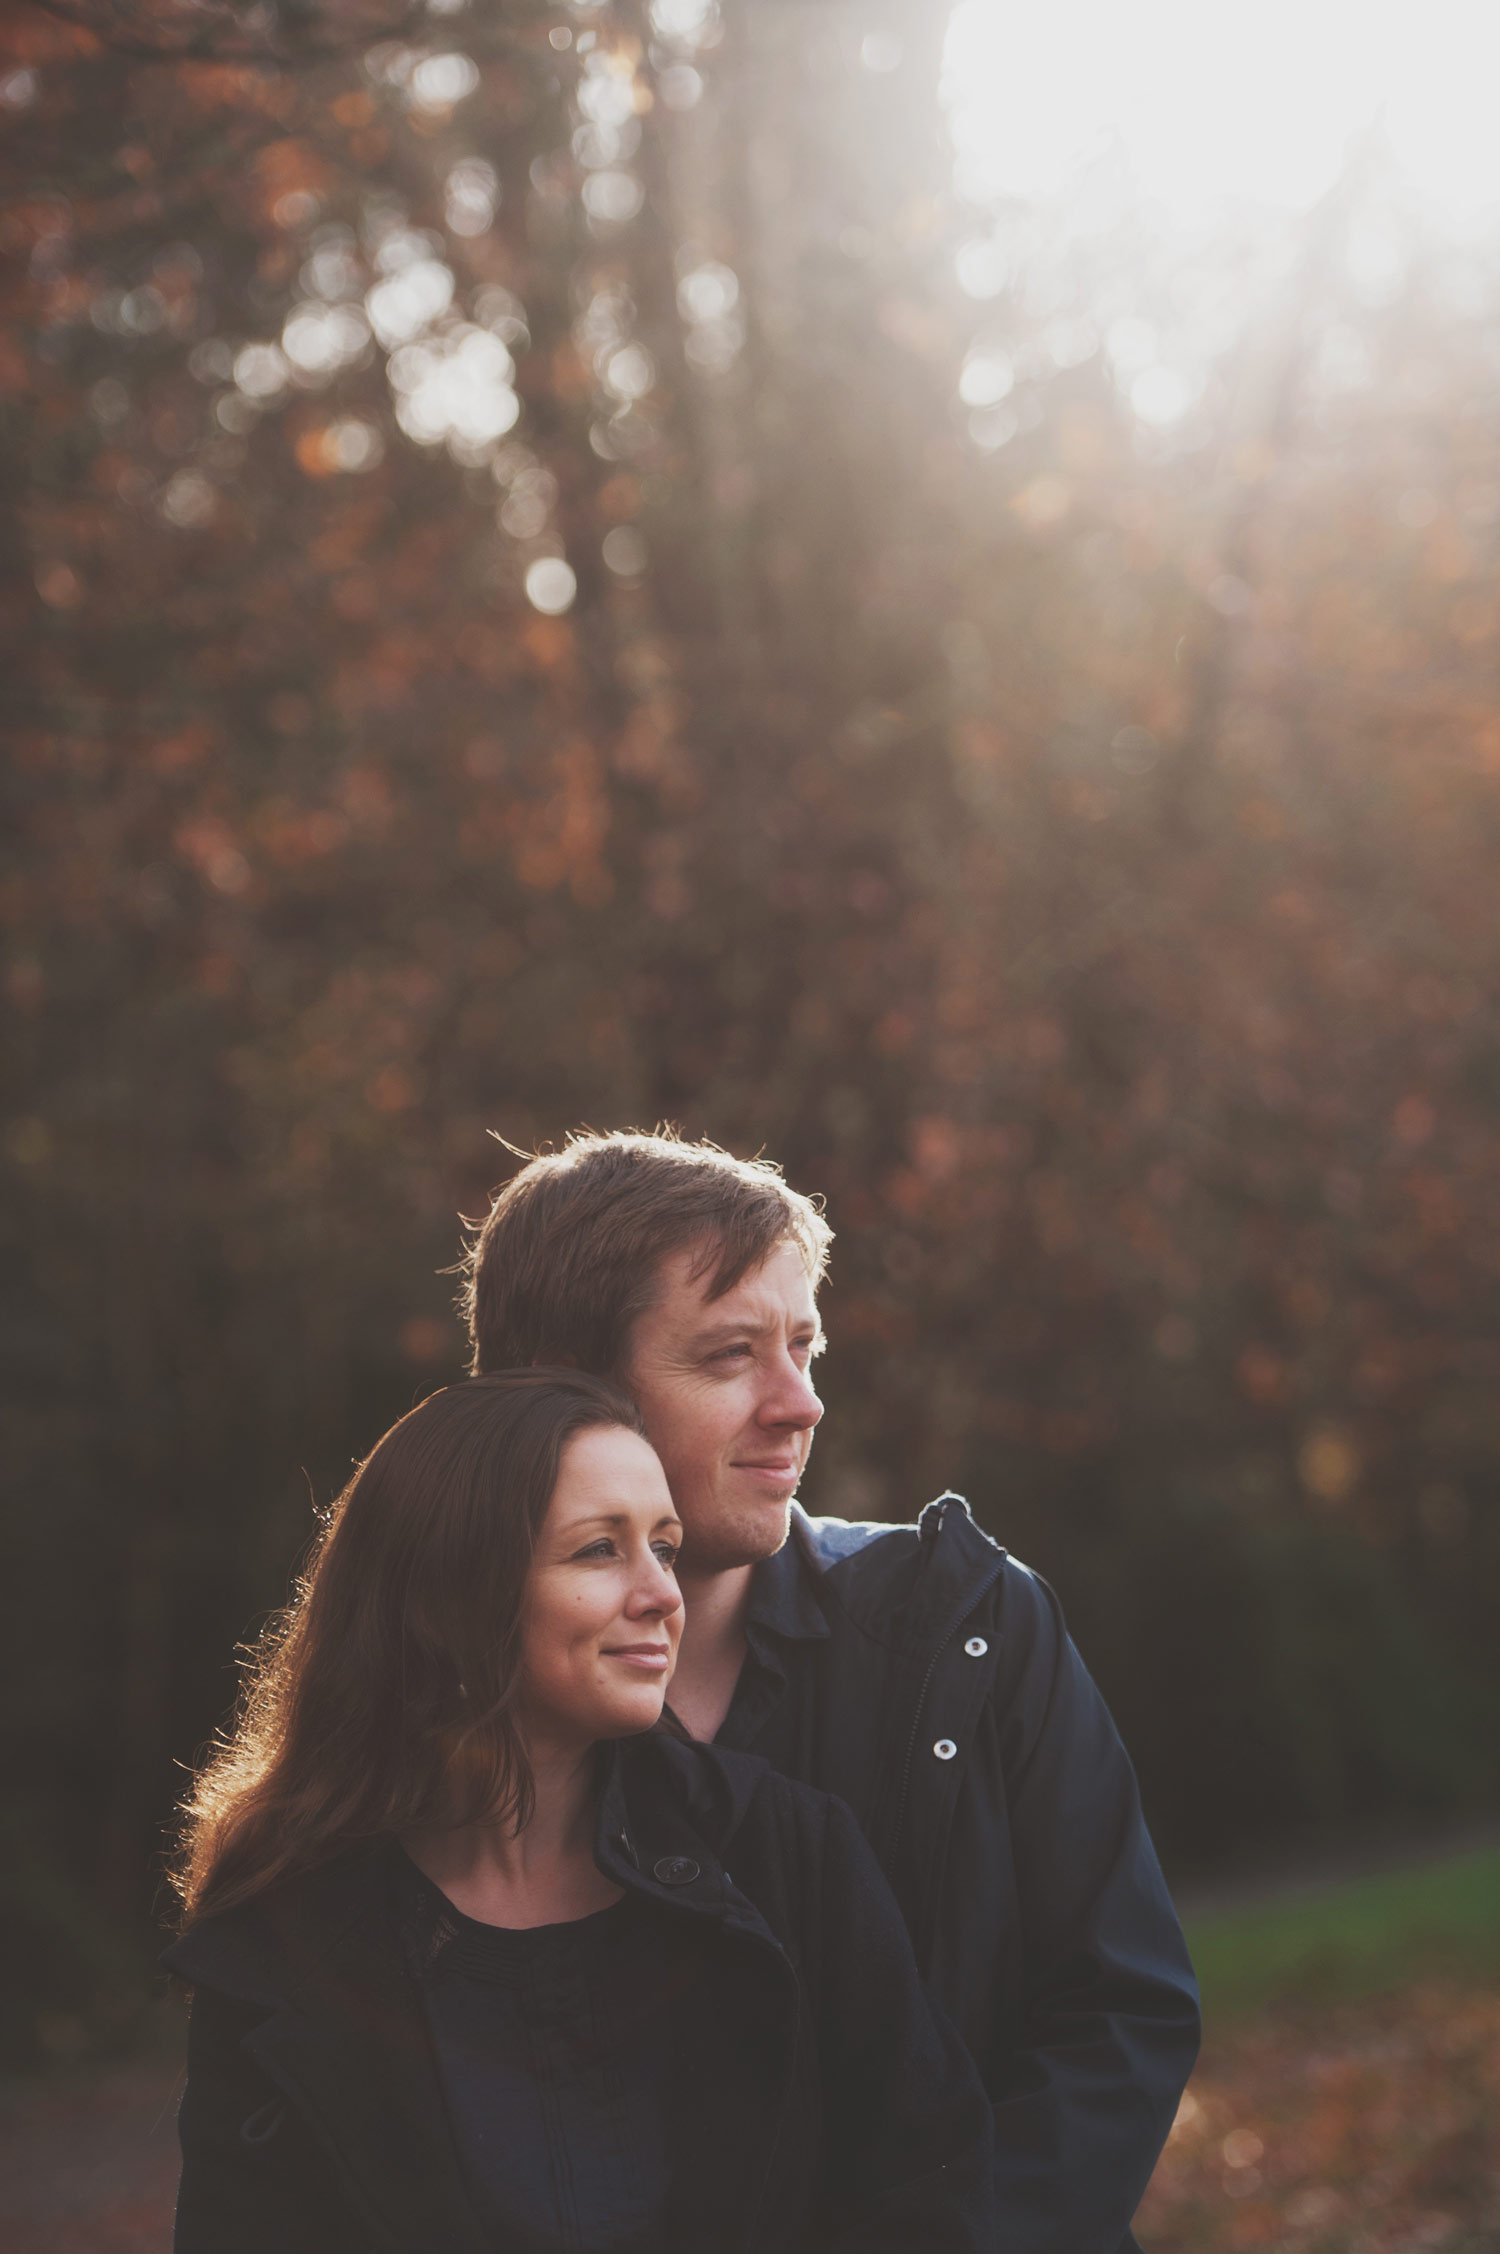 Engagement-Shoot-Wedding-Photography-Videography-Kildare-Ireland-24.jpg